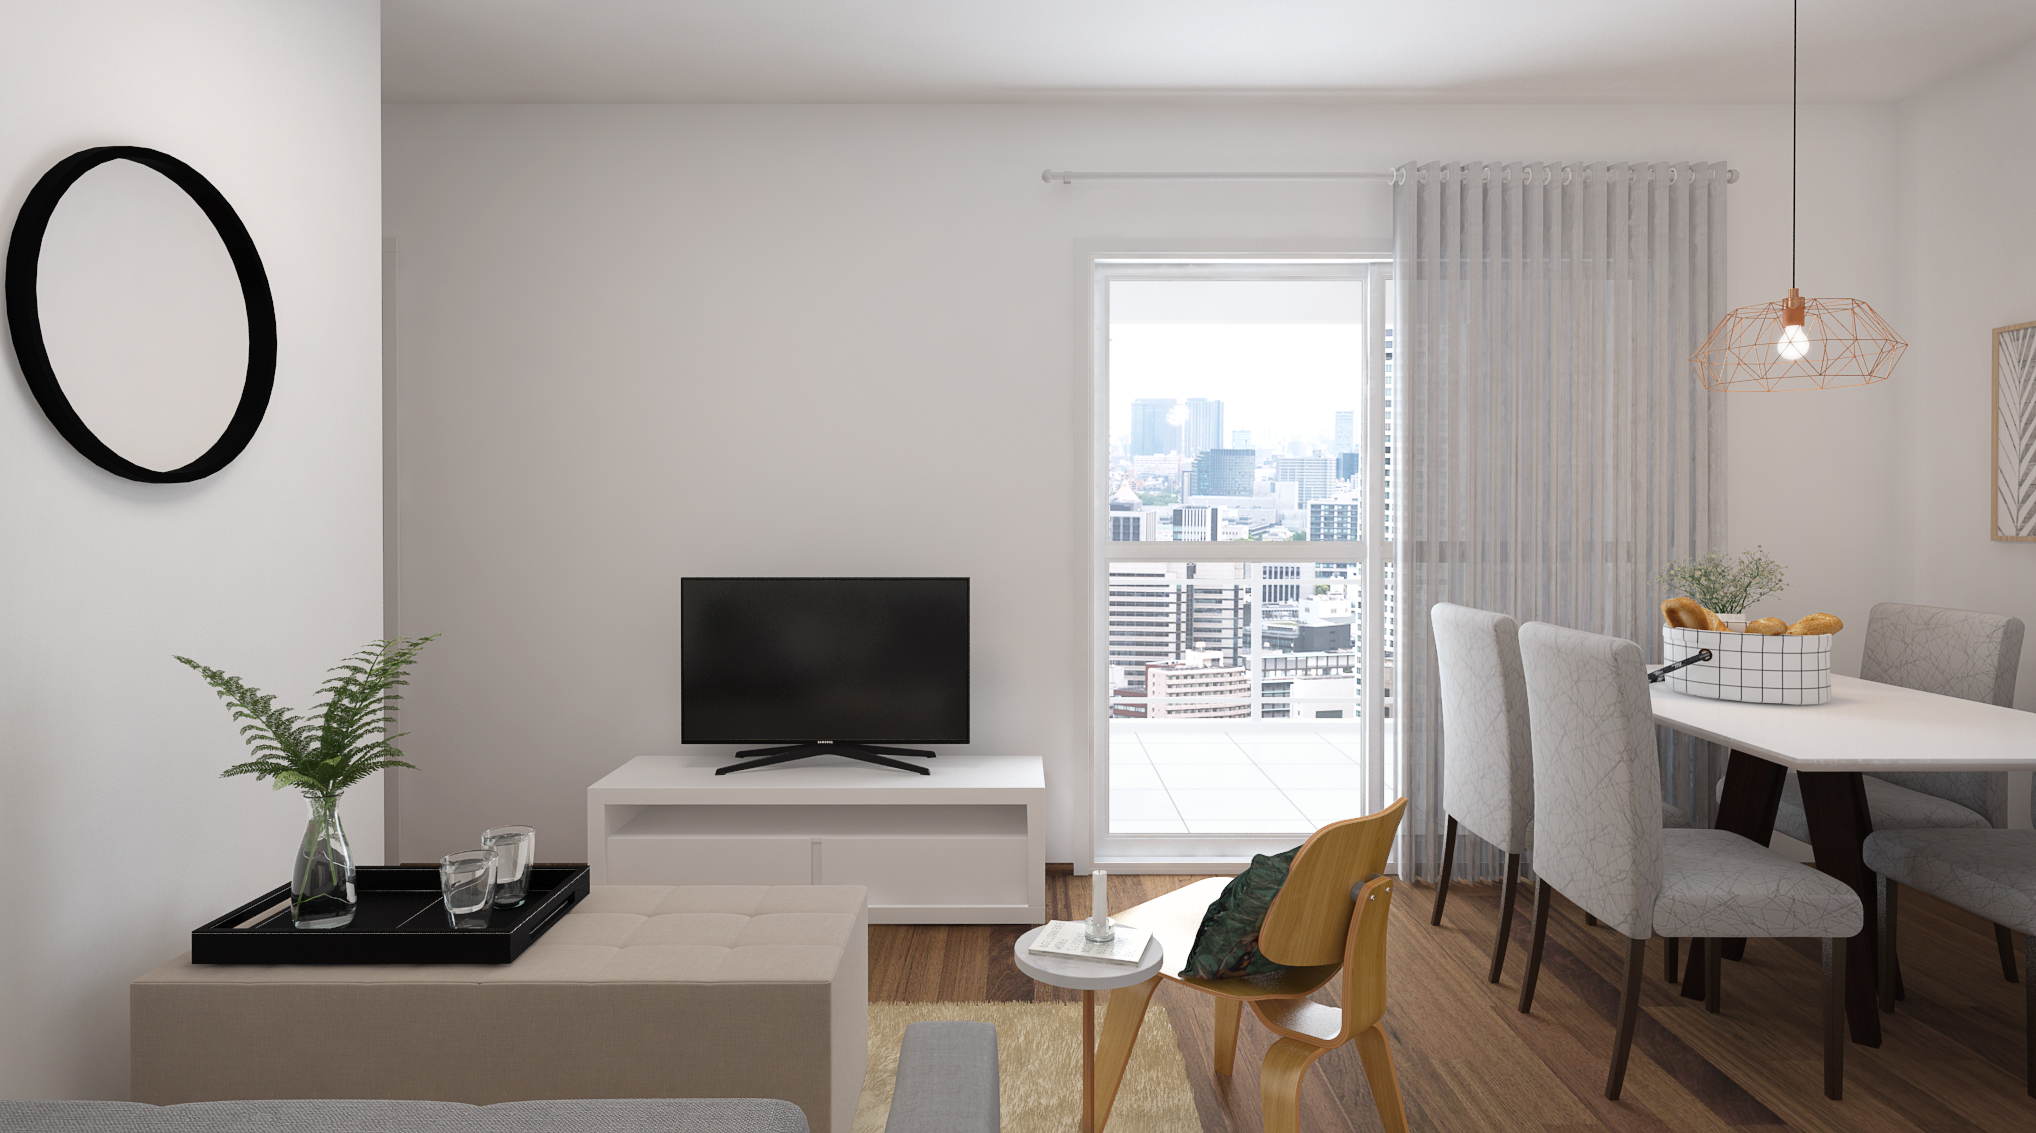 Sala Integrada estilo Moderno sofisticado Cool